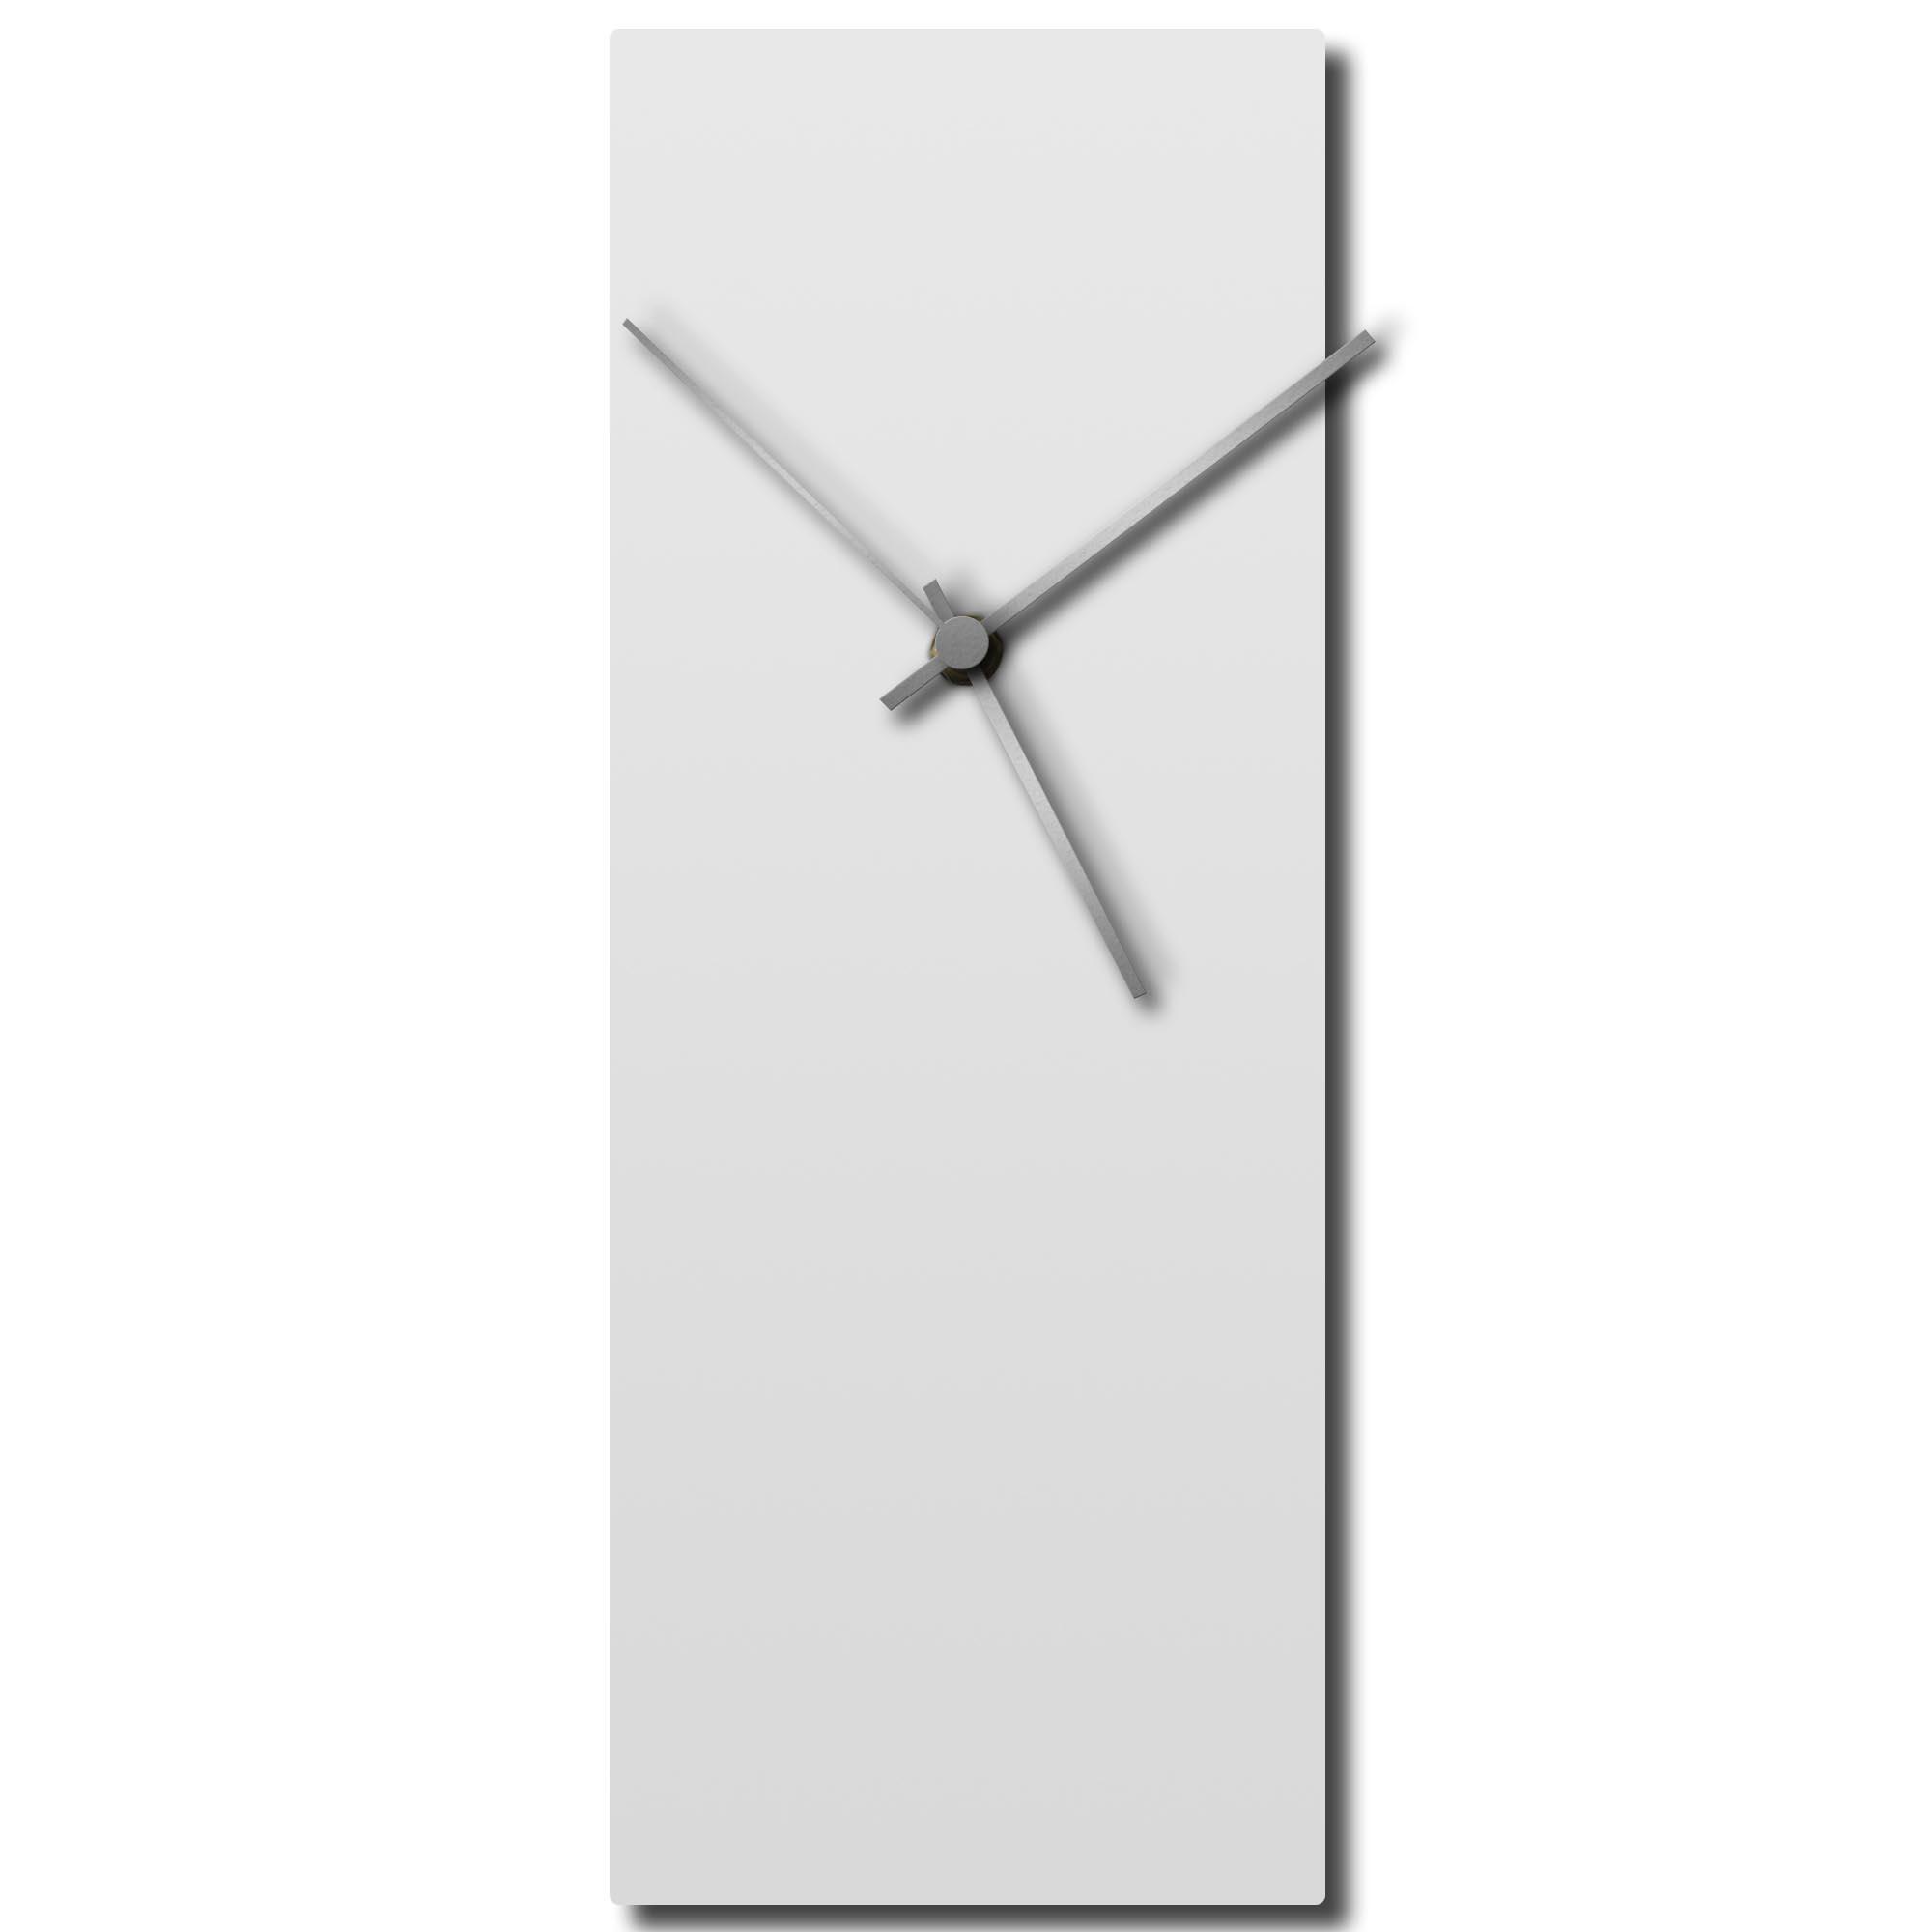 Adam Schwoeppe 'Whiteout Silver Clock' Midcentury Modern Style Wall Clock